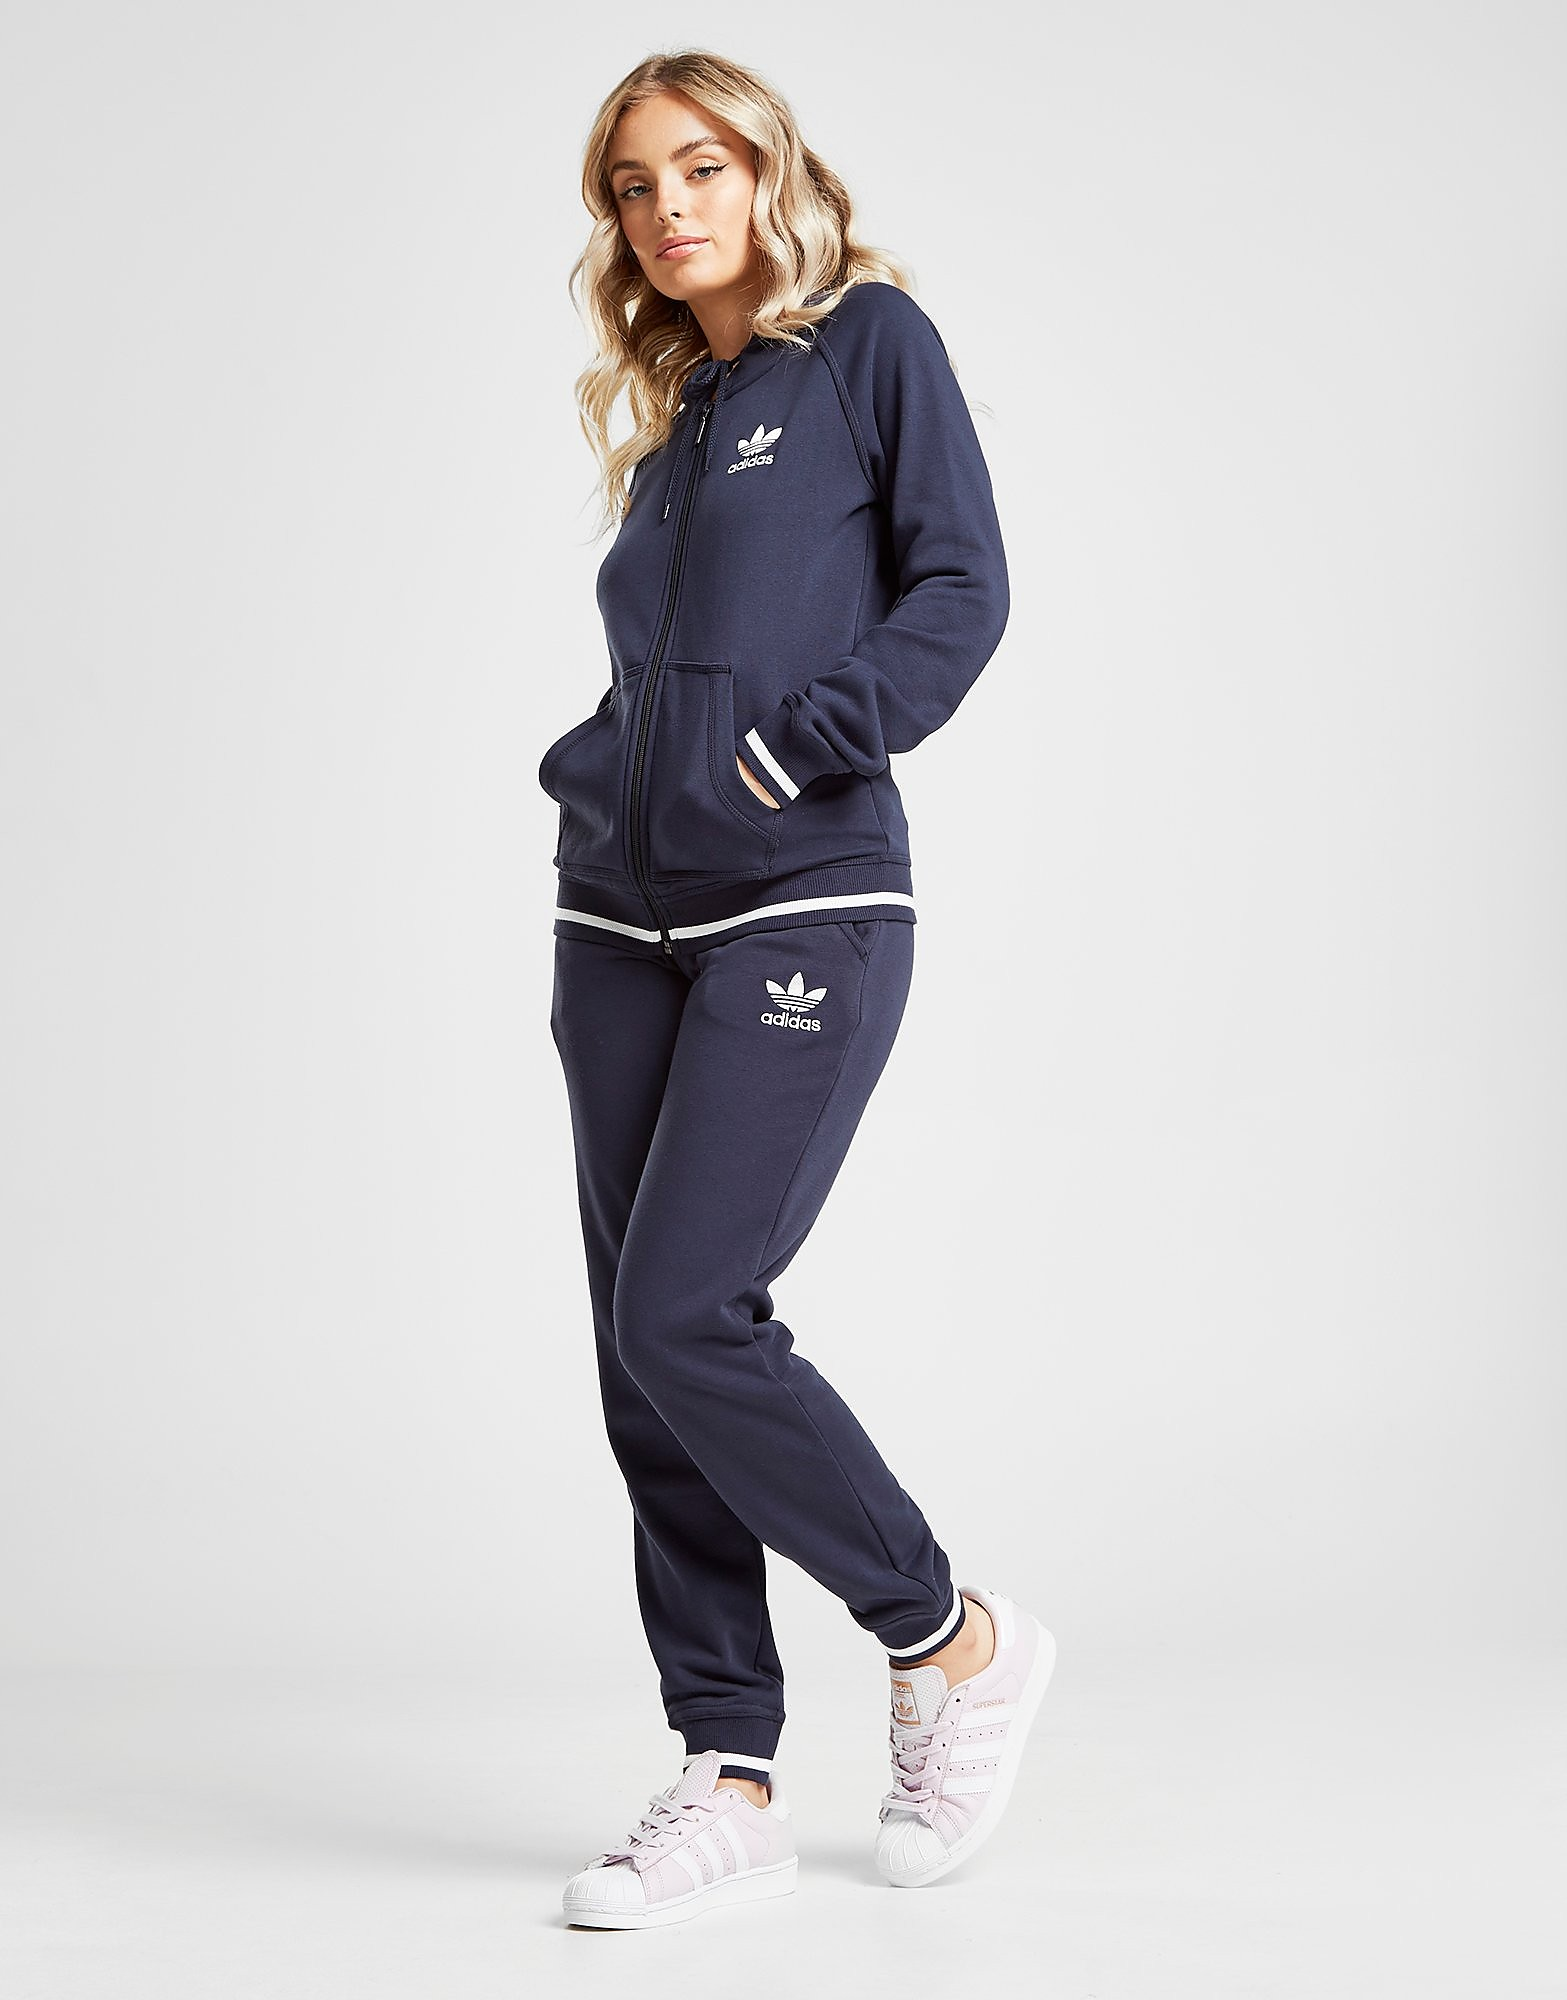 adidas Originals Trefoil Stripe Fleece Track Pants - Only at JD - Blau - Womens, Blau